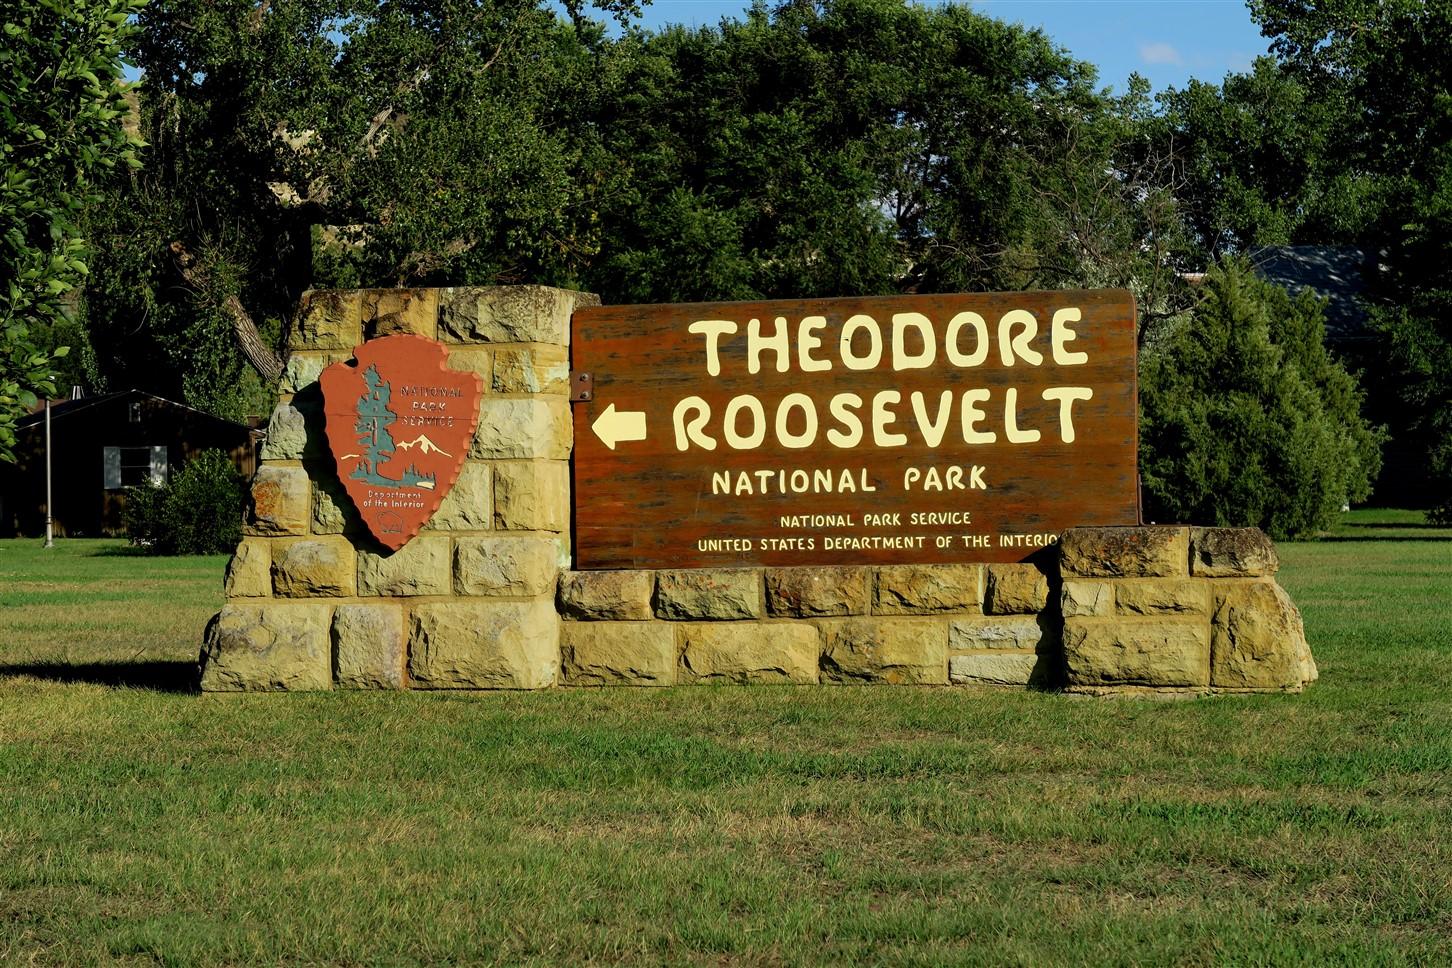 2015 09 08 15 Theodore Roosevelt National Park ND.jpg